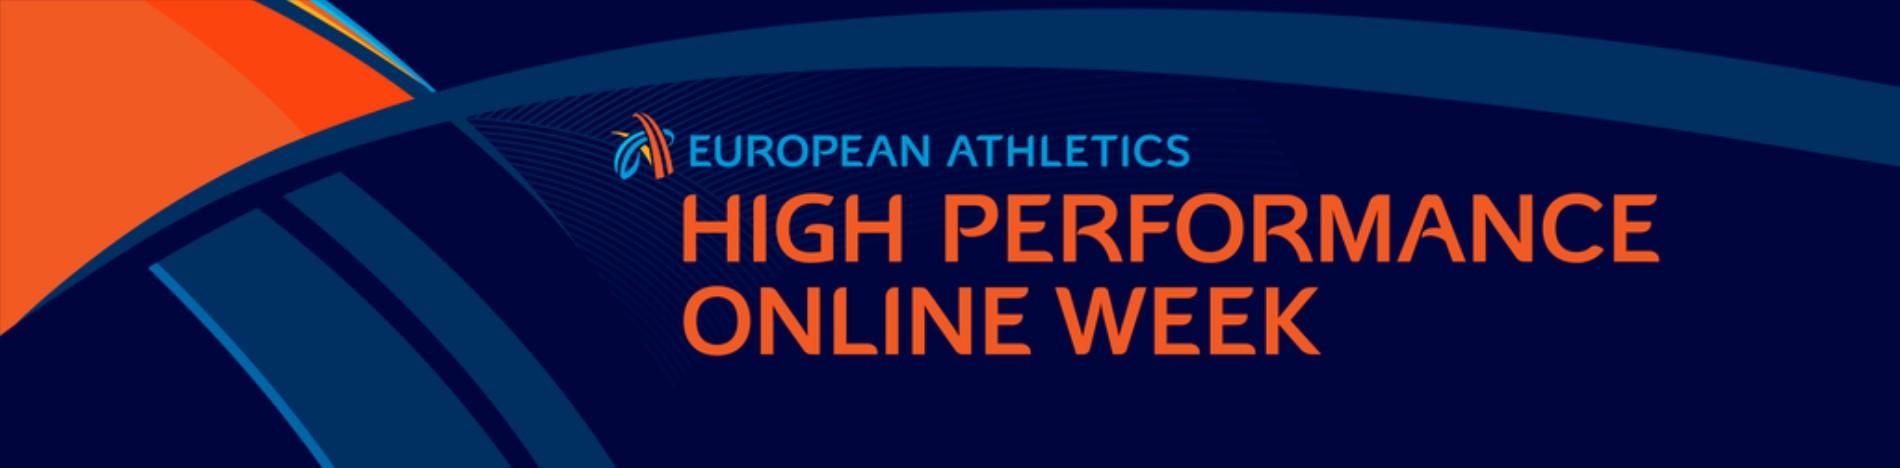 European Athletics High Performance Online Week